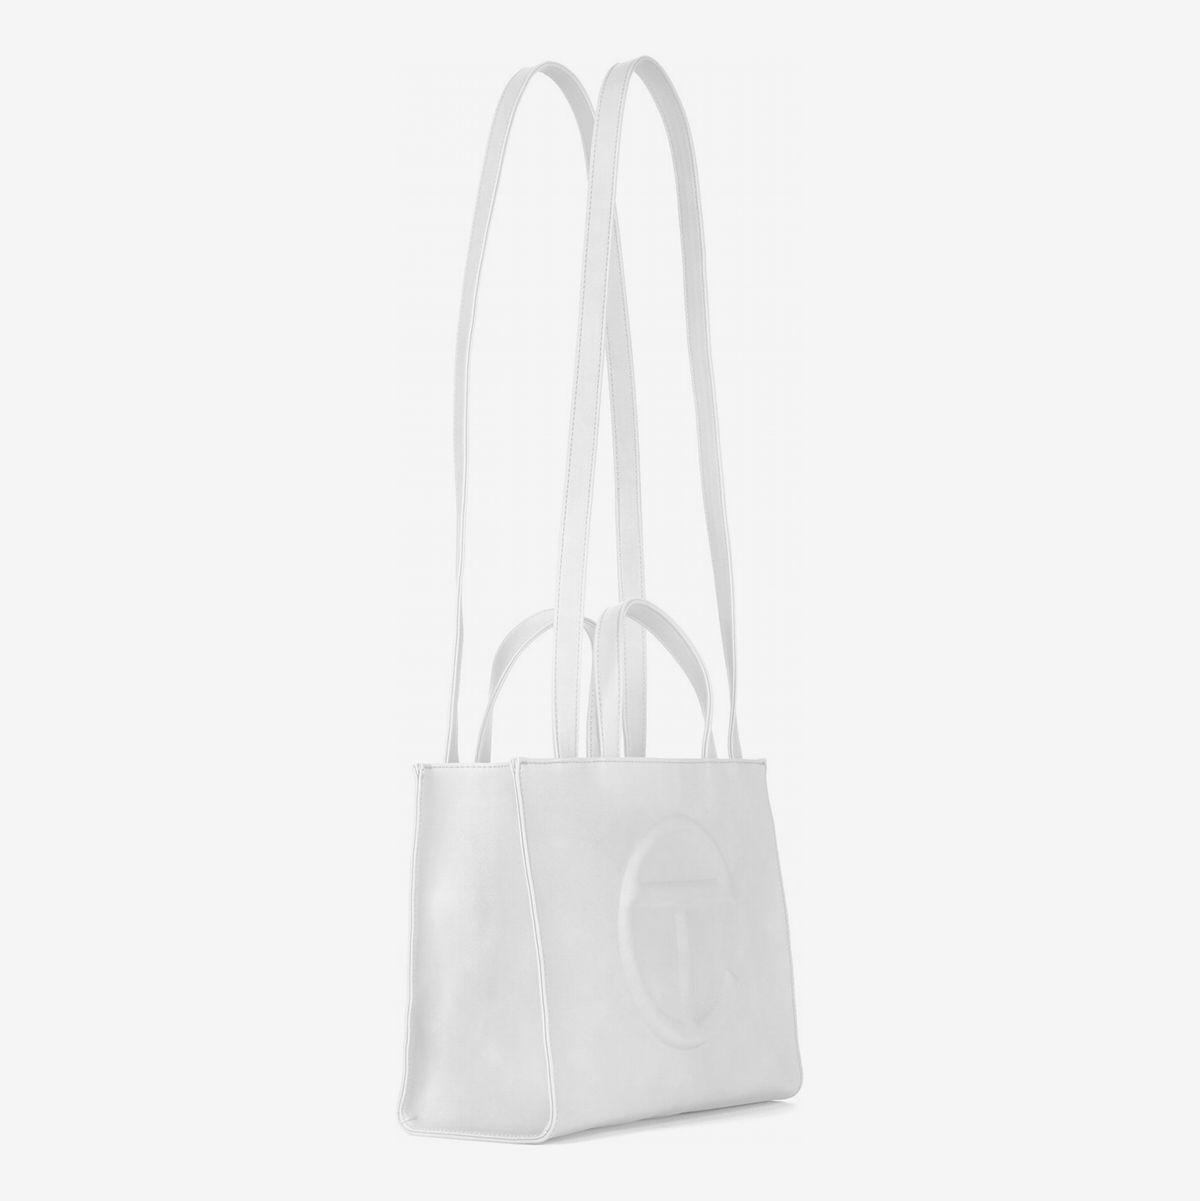 Woman Lady Medium Canvas Tote Top Handled Shoulder Fashion shining Star Bags